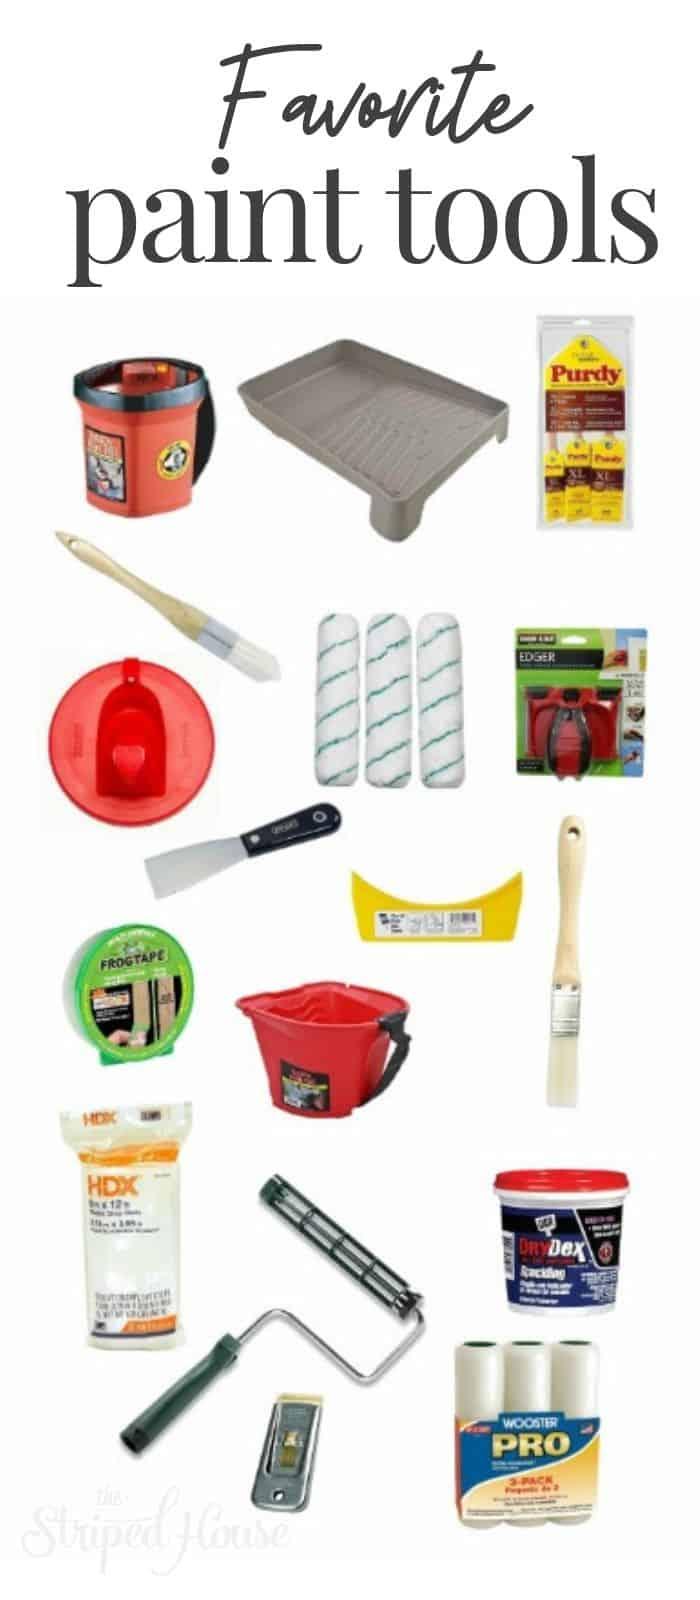 My favorite home painting tools.  #homedecor #painting #interiordesign #diy #diy decor